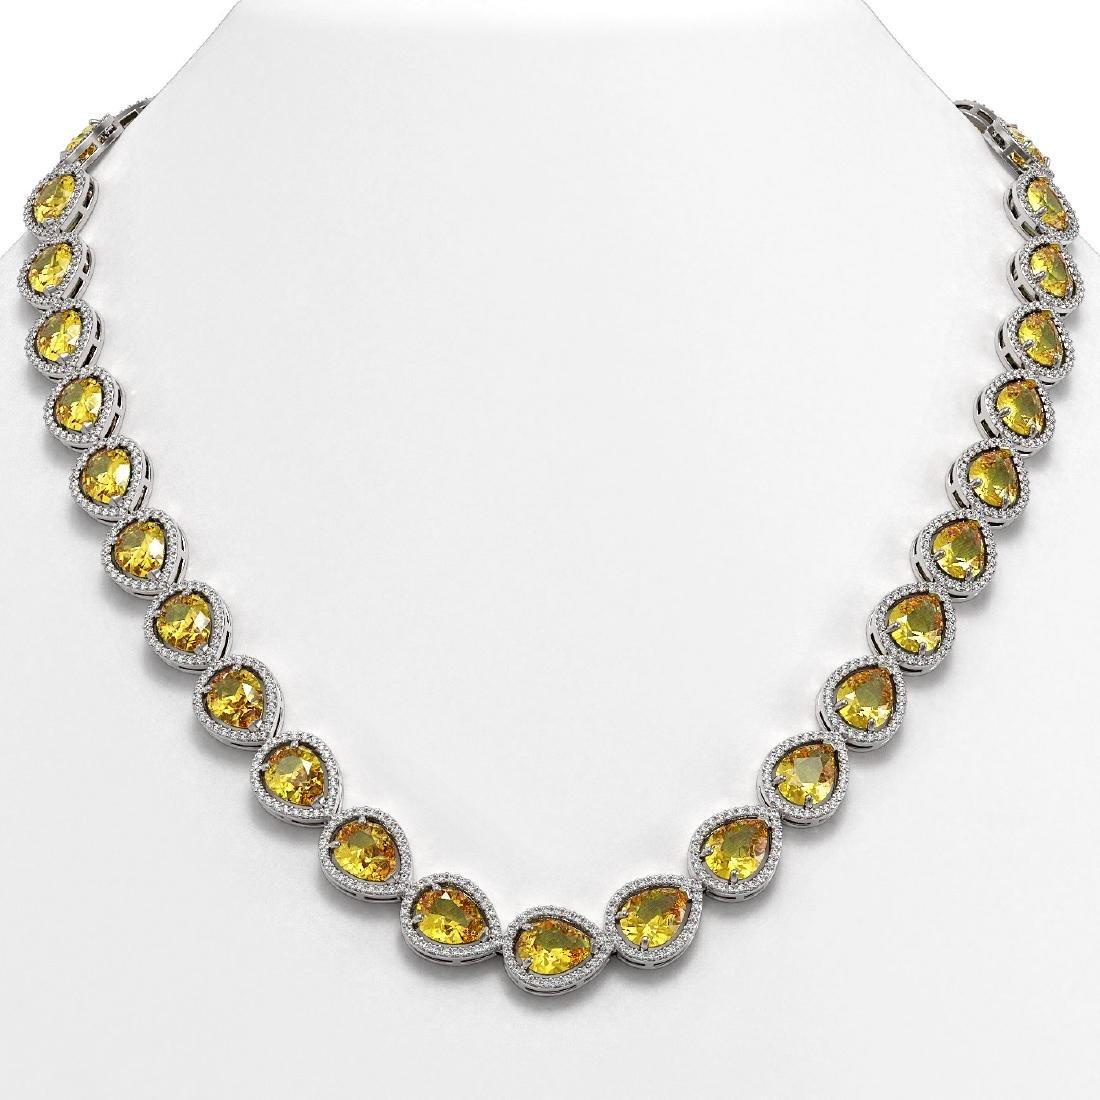 36.8 CTW Fancy Citrine & Diamond Halo Necklace 10K